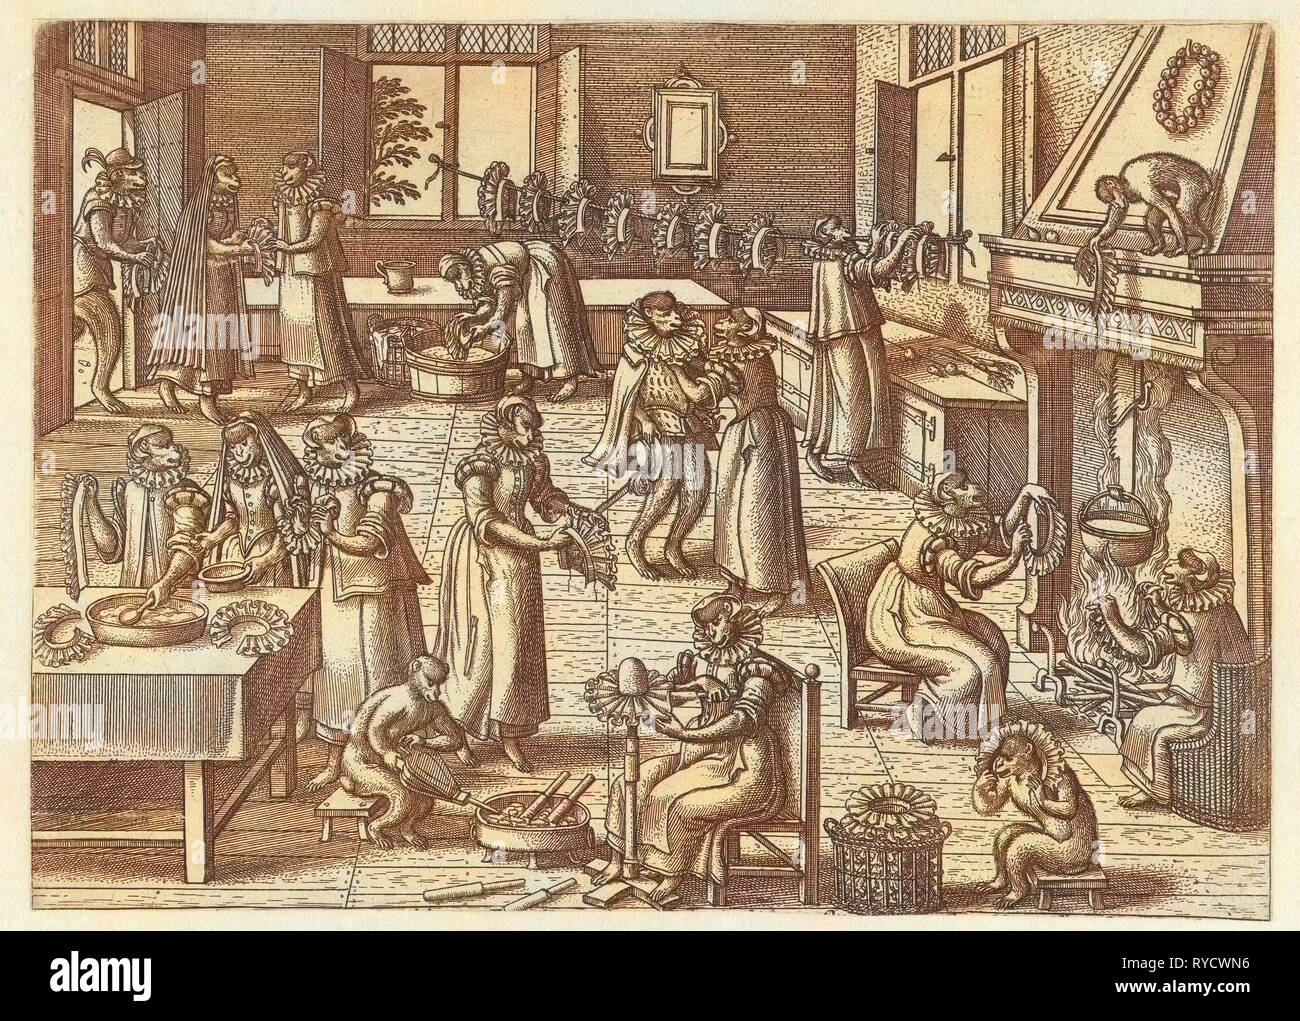 Collar Workshop, Pieter van der Borcht (I), Philips Galle, 1545 - 1608 - Stock Image